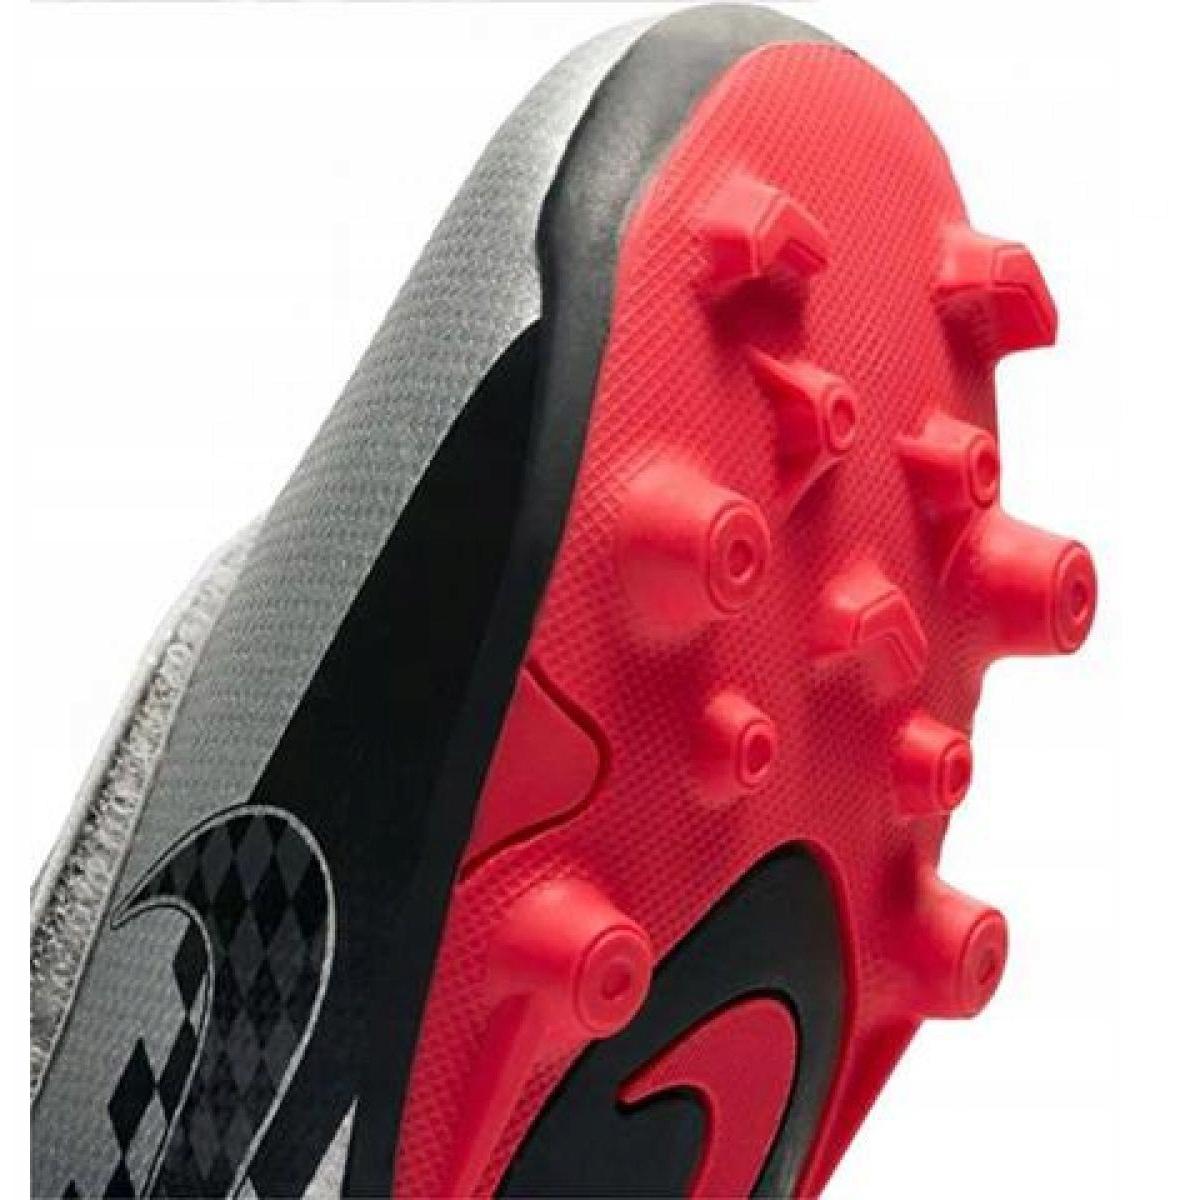 Cuarto vida George Eliot  Nike Mercurial Vapor 13 Club Neymar Mg PS (V) Jr AT8164-006 football shoes  grey black - ButyModne.pl